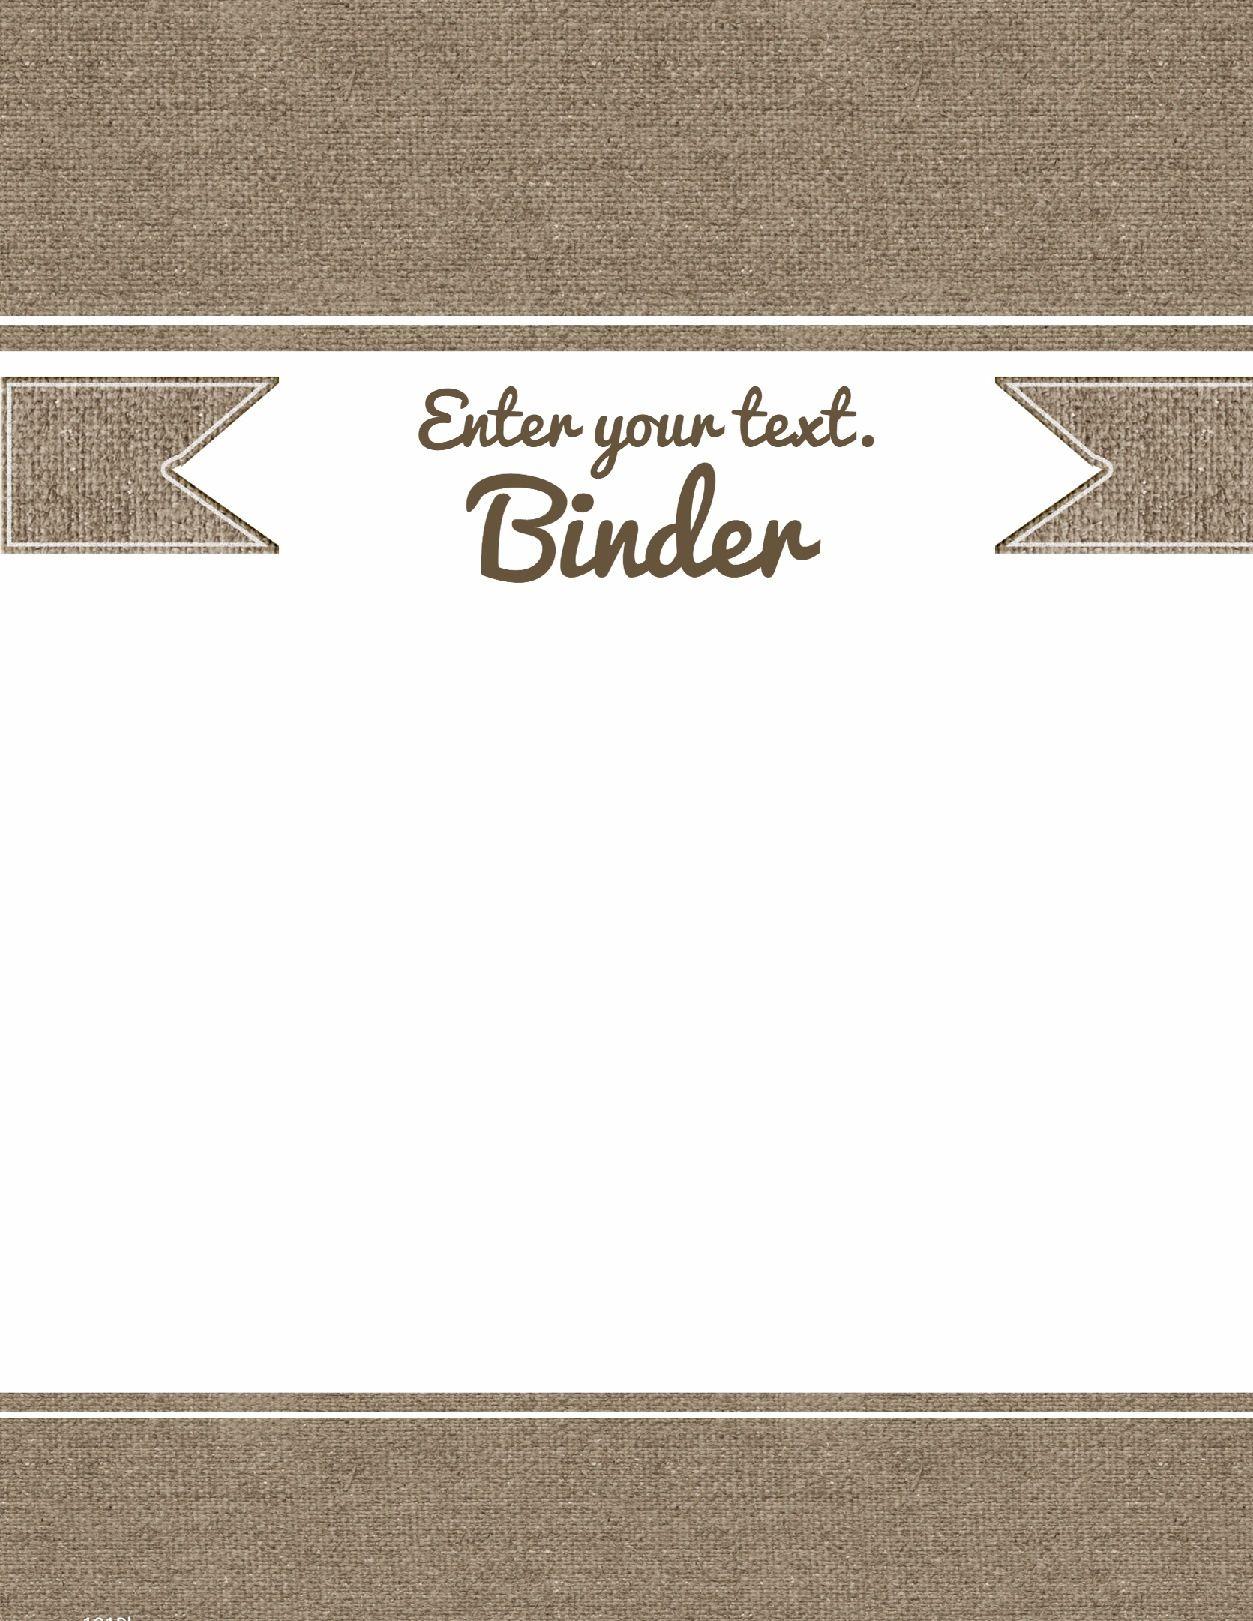 Free Binder Cover Templates | Homeroom | Pinterest | Binder Cover - Free Printable Binder Cover Templates